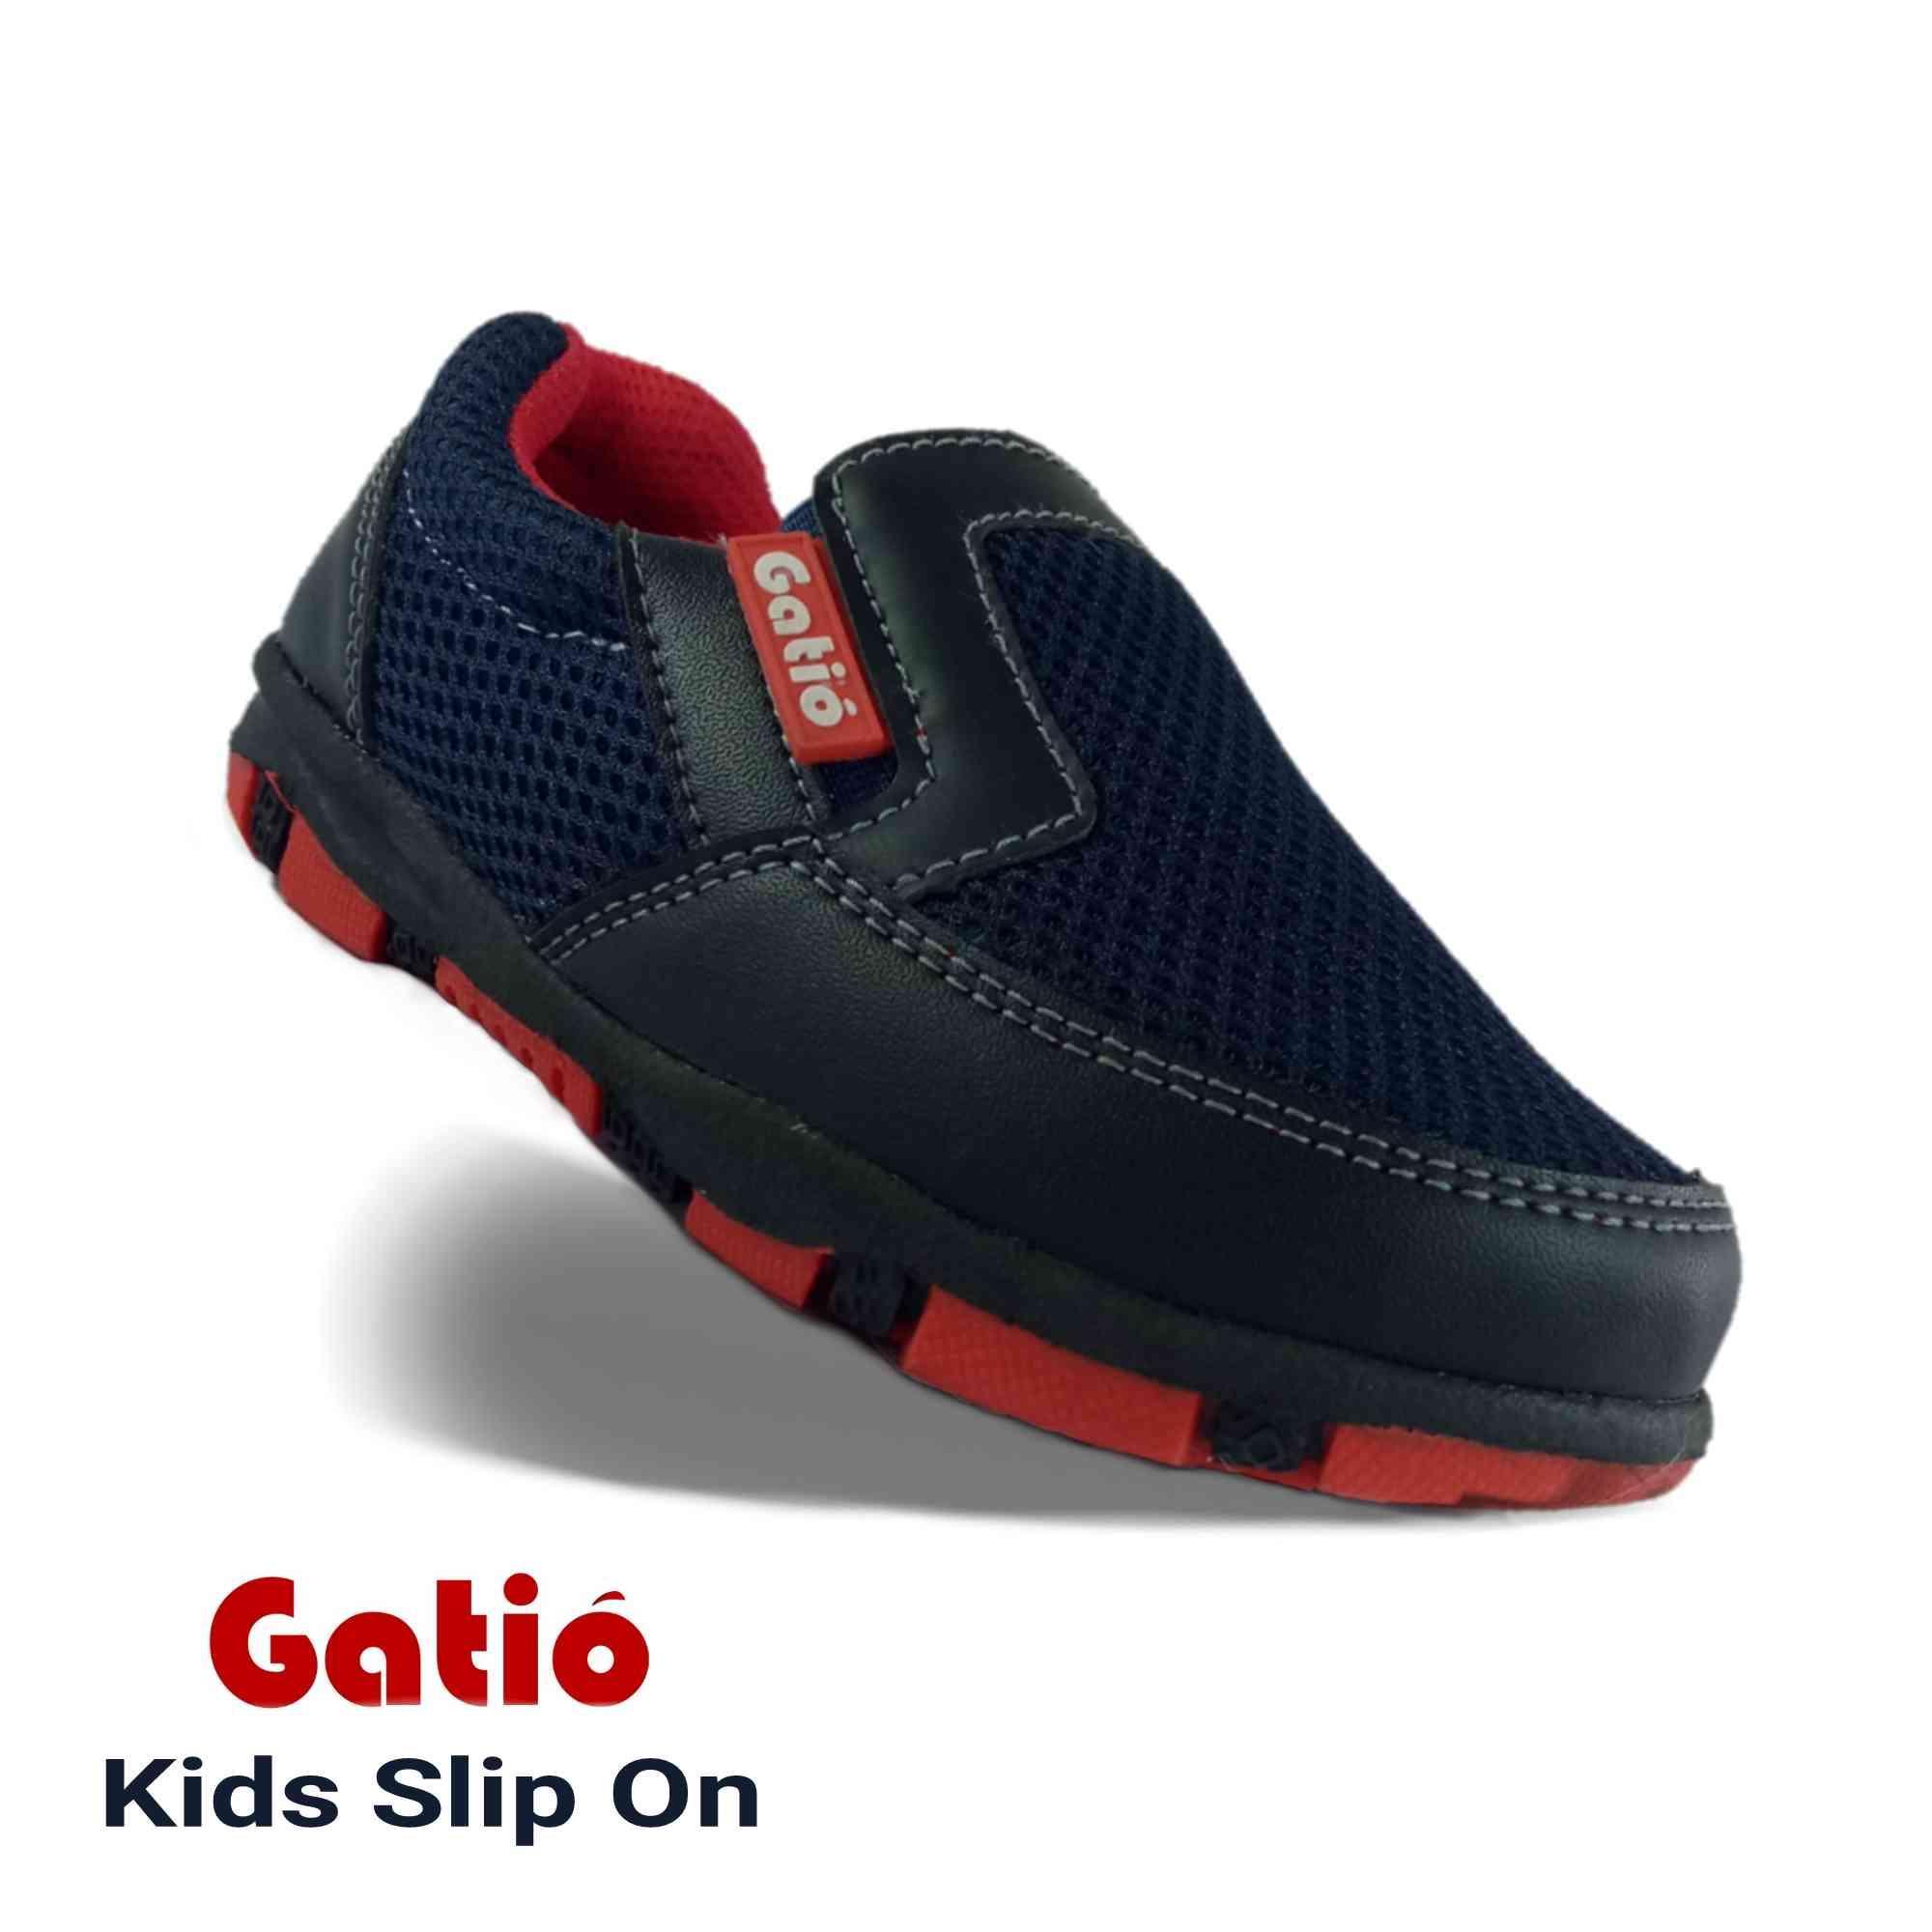 Gatio / Sepatu Anak Laki Laki Cowok / Sepatu Anak Anti Licin / Sepatu Sekolah Anak Playgrup TK / Sepatu Sneakers Anak laki laki / Sepatu Anak Laki laki cowok 2 3 4 5 6 7 tahun / Sepatu anak ukuran 28 29 30 31 32